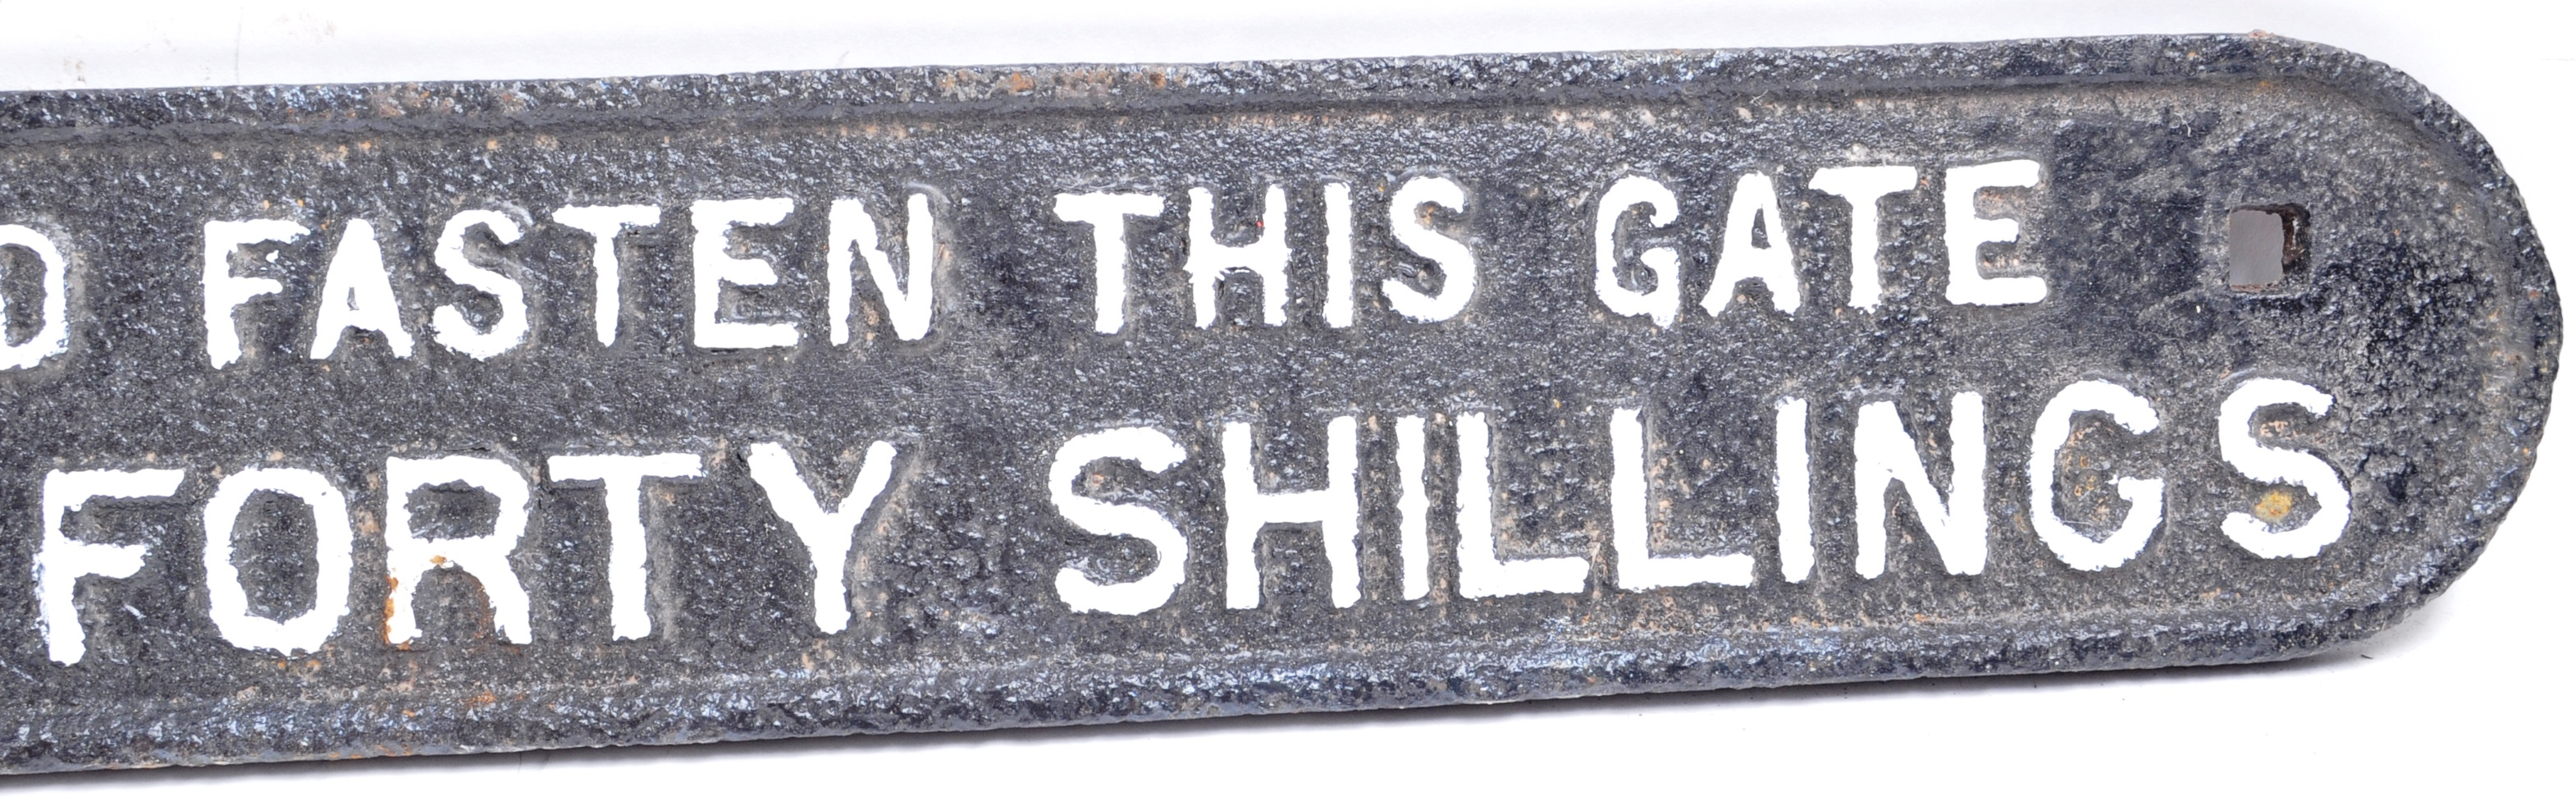 ORIGINAL VINTAGE BRITISH RAILWAYS CAST IRON WARNING SIGN - Image 4 of 5